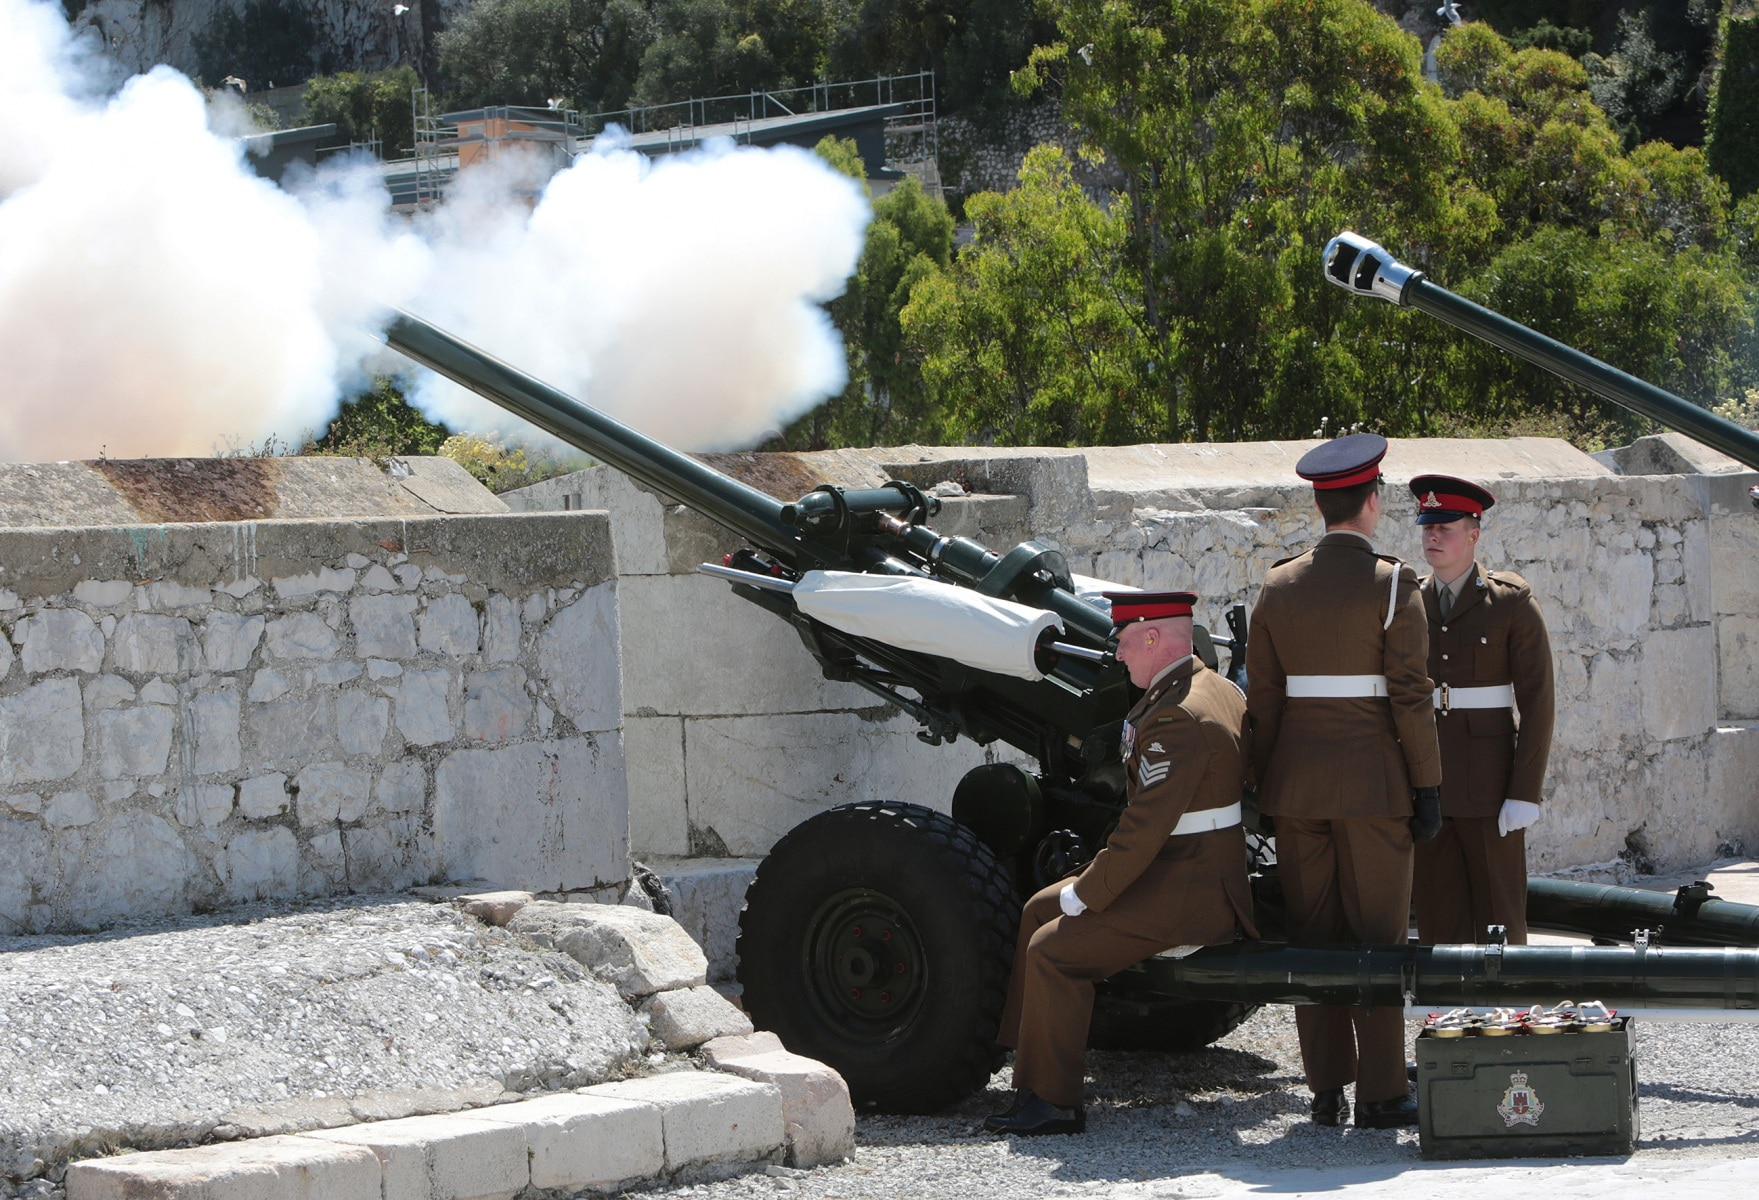 2-jun-2016-salvas-en-gibraltar-honor-al-aniversario-de-coronacin-de-la-reina_27417181165_o